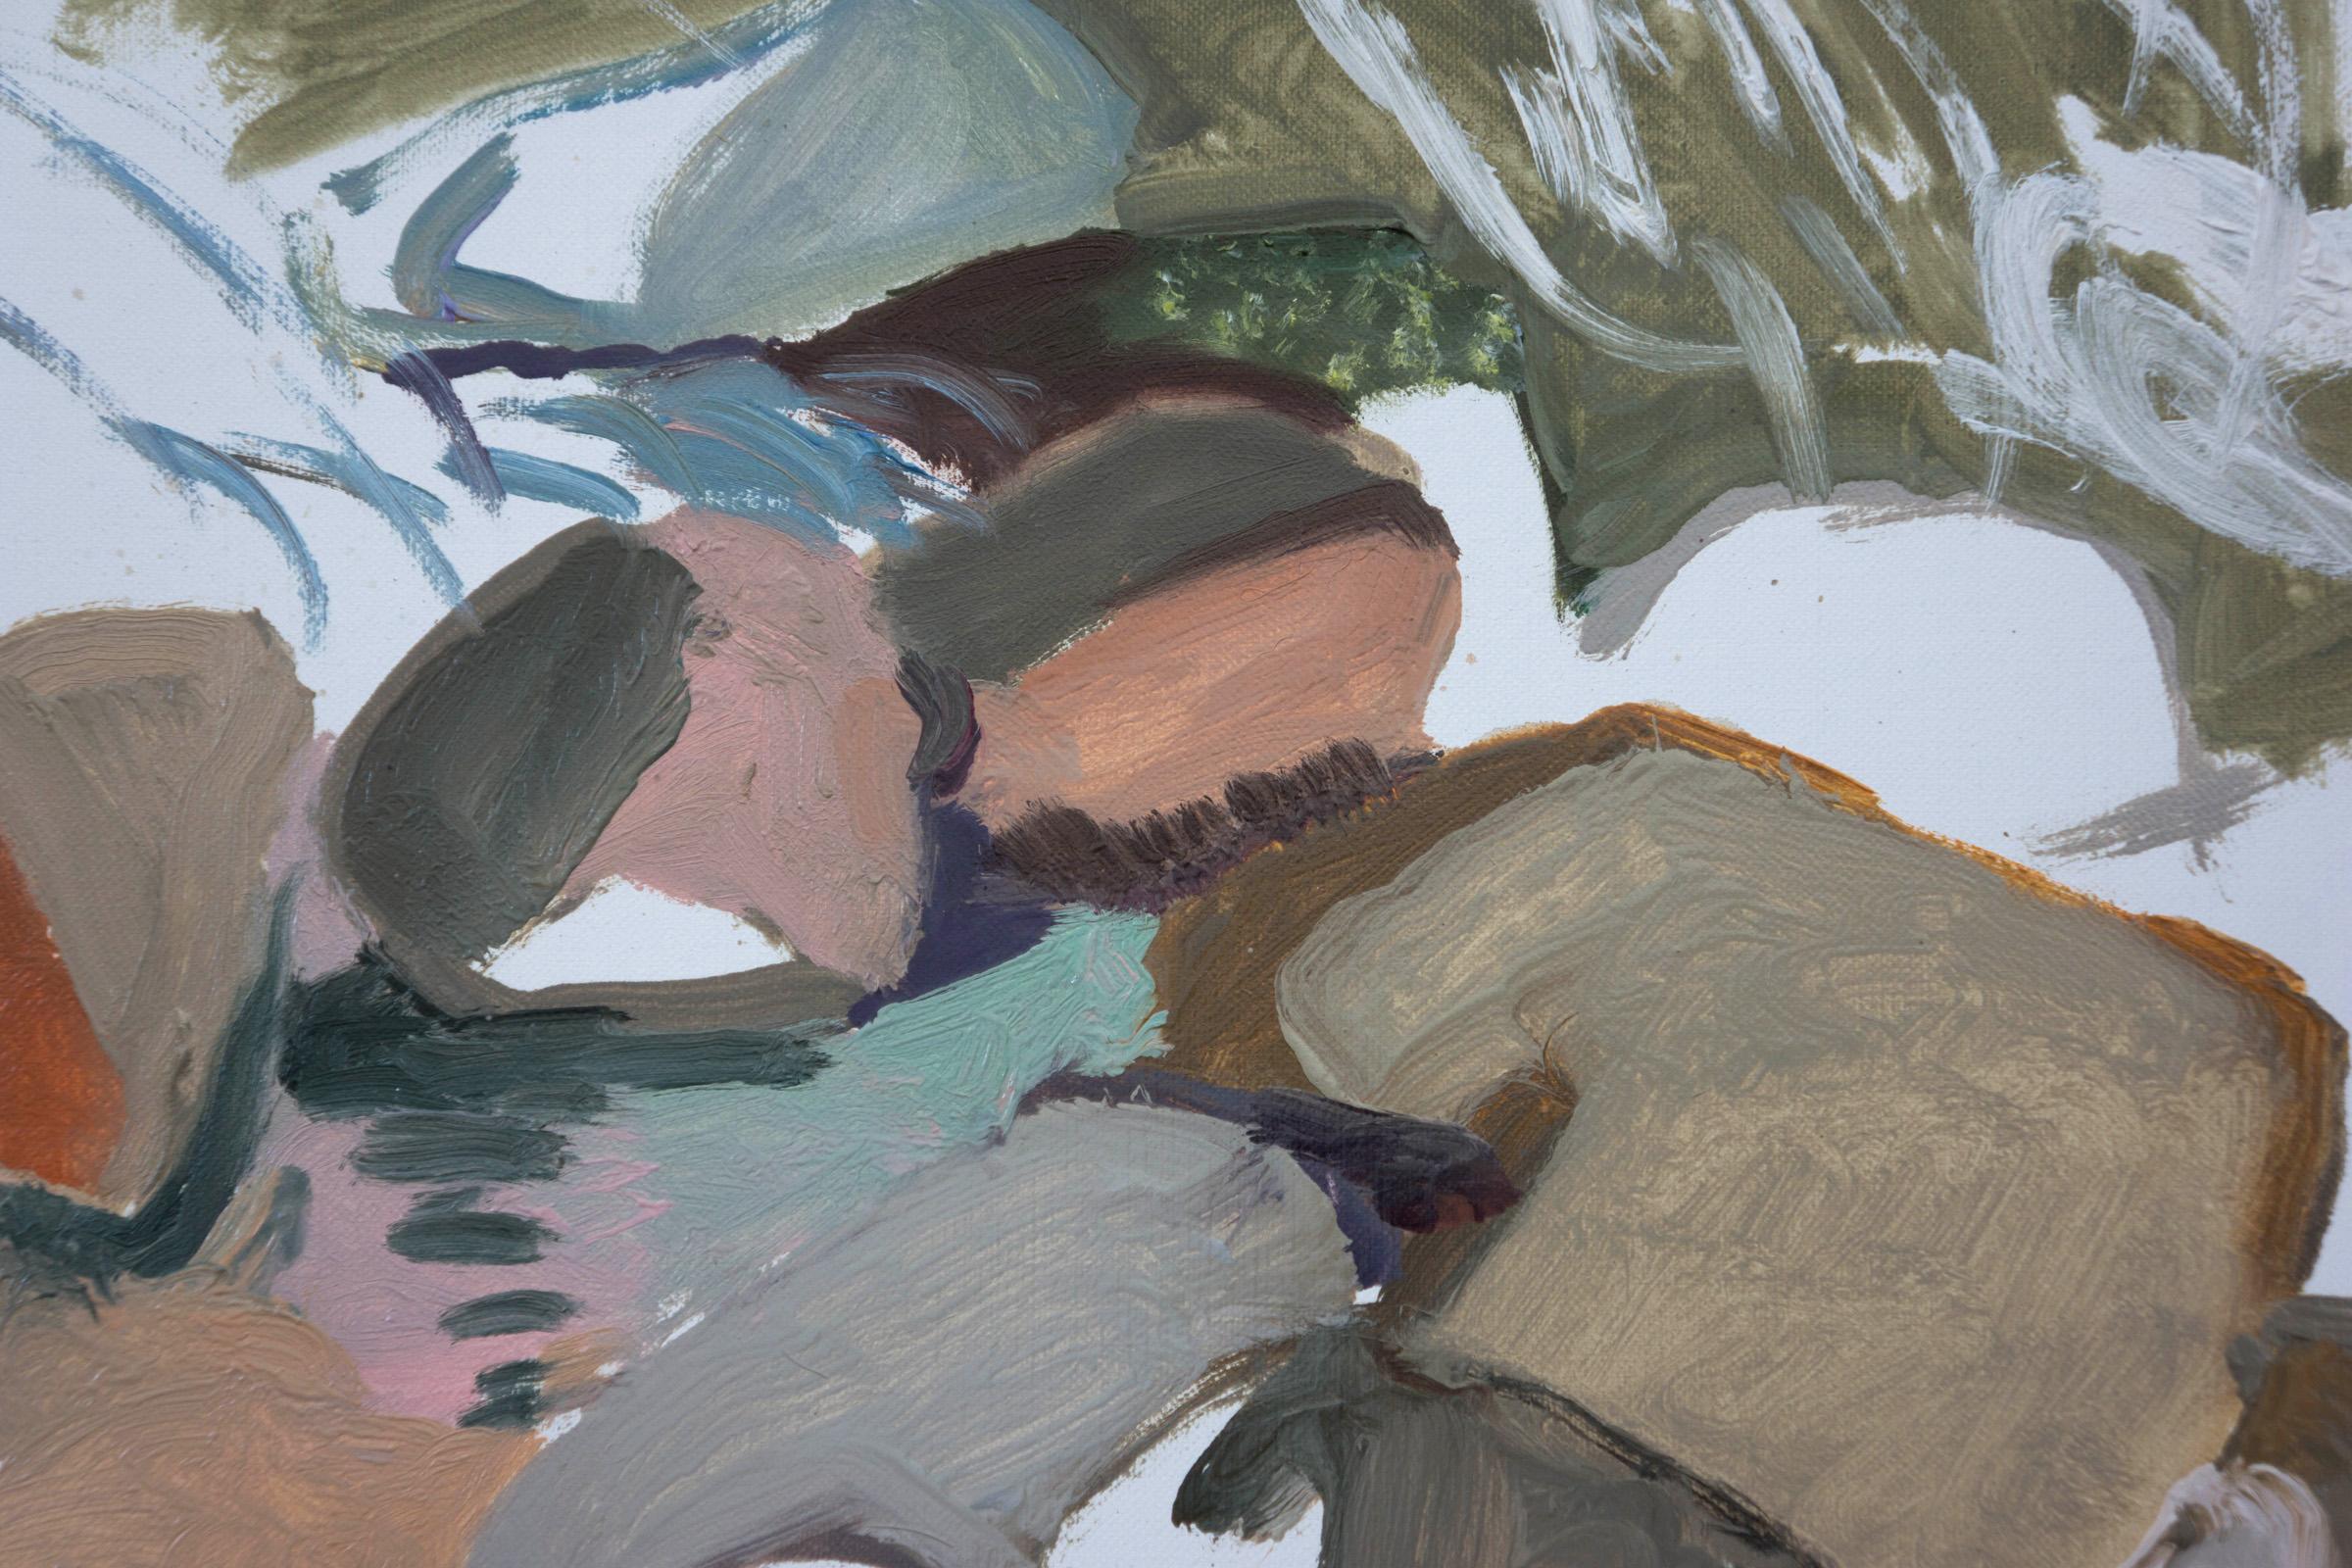 "DETAIL: 10/20/14 north crestone creek  16x16"" oil on portrait linen"